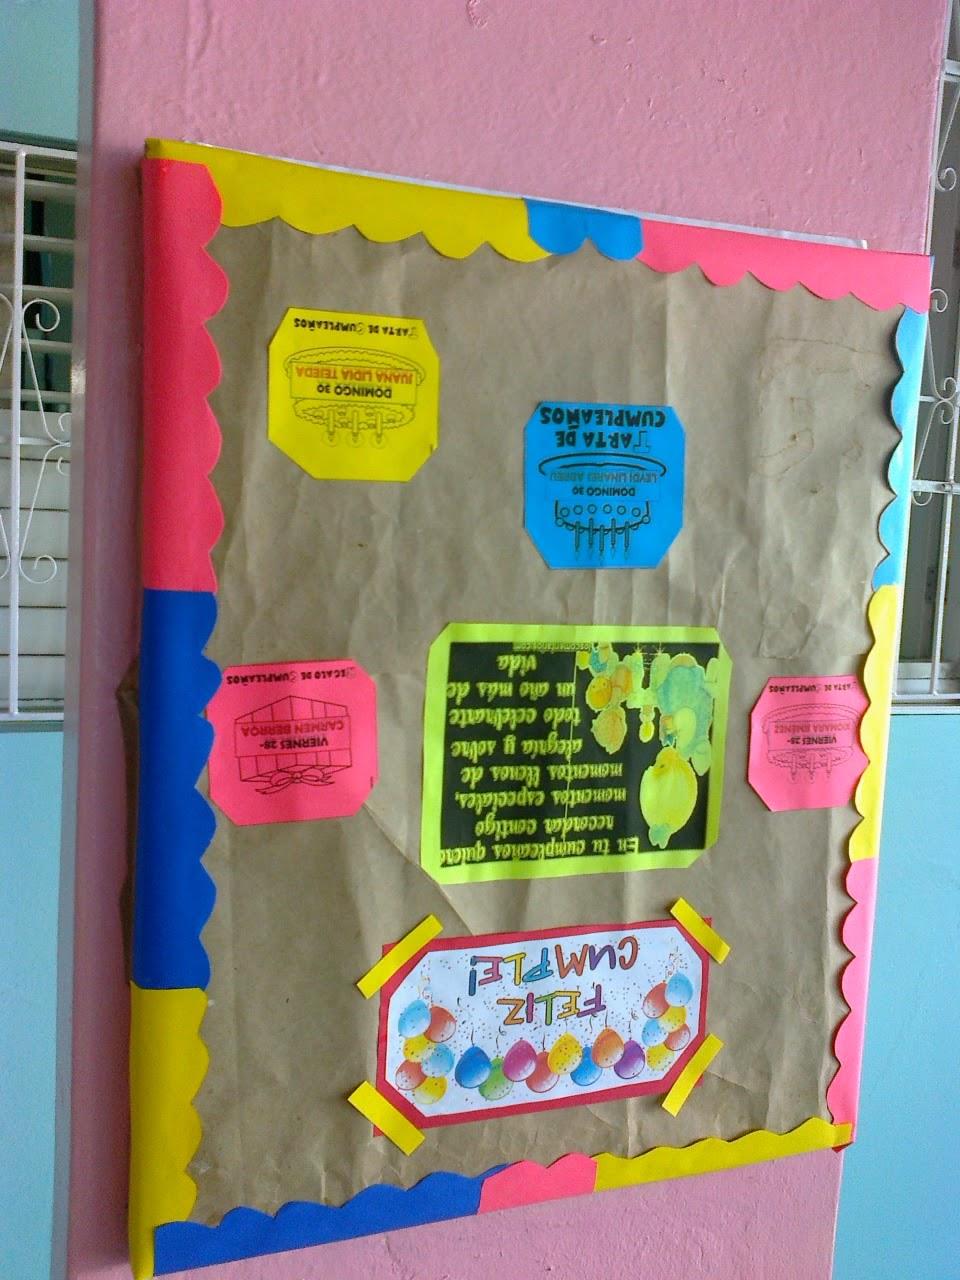 Entretenimientos infantiles decoraci n de mural for Como decorar un mural